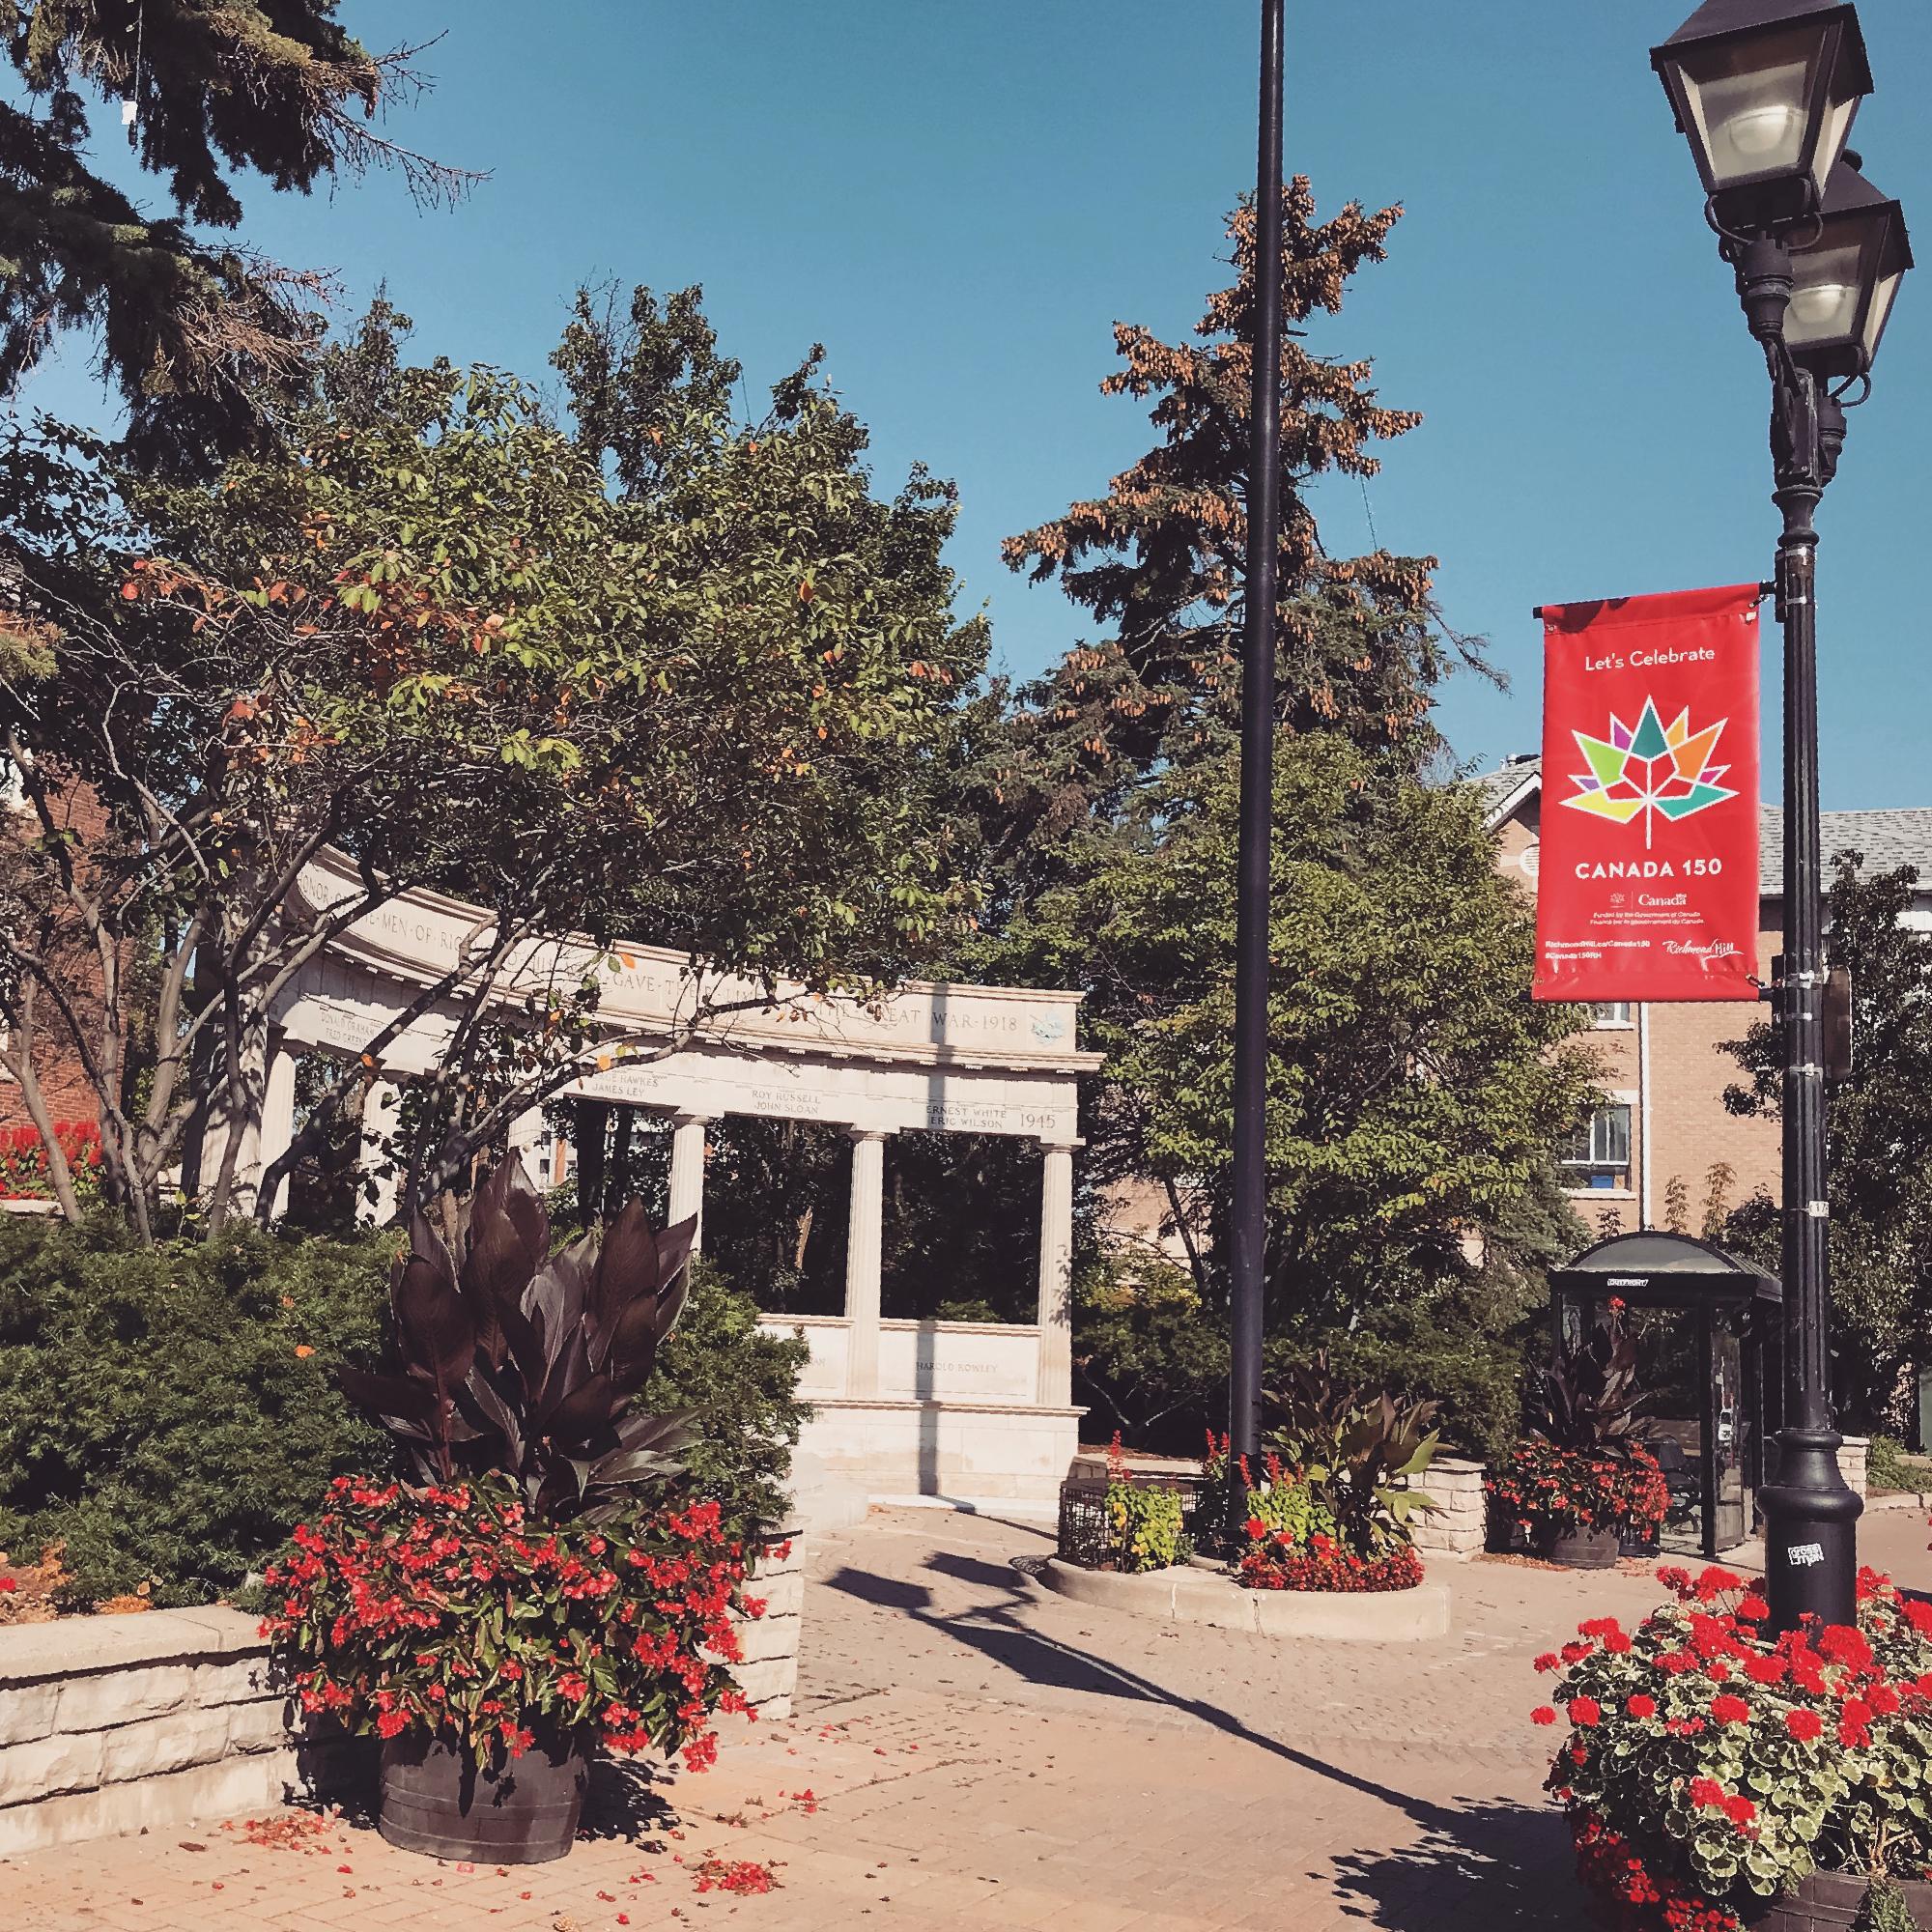 Toronto Branding Design Consultancy agency – Canada 150 Official Branding – Street Banner Design in downtown Richmond Hill, Ontario